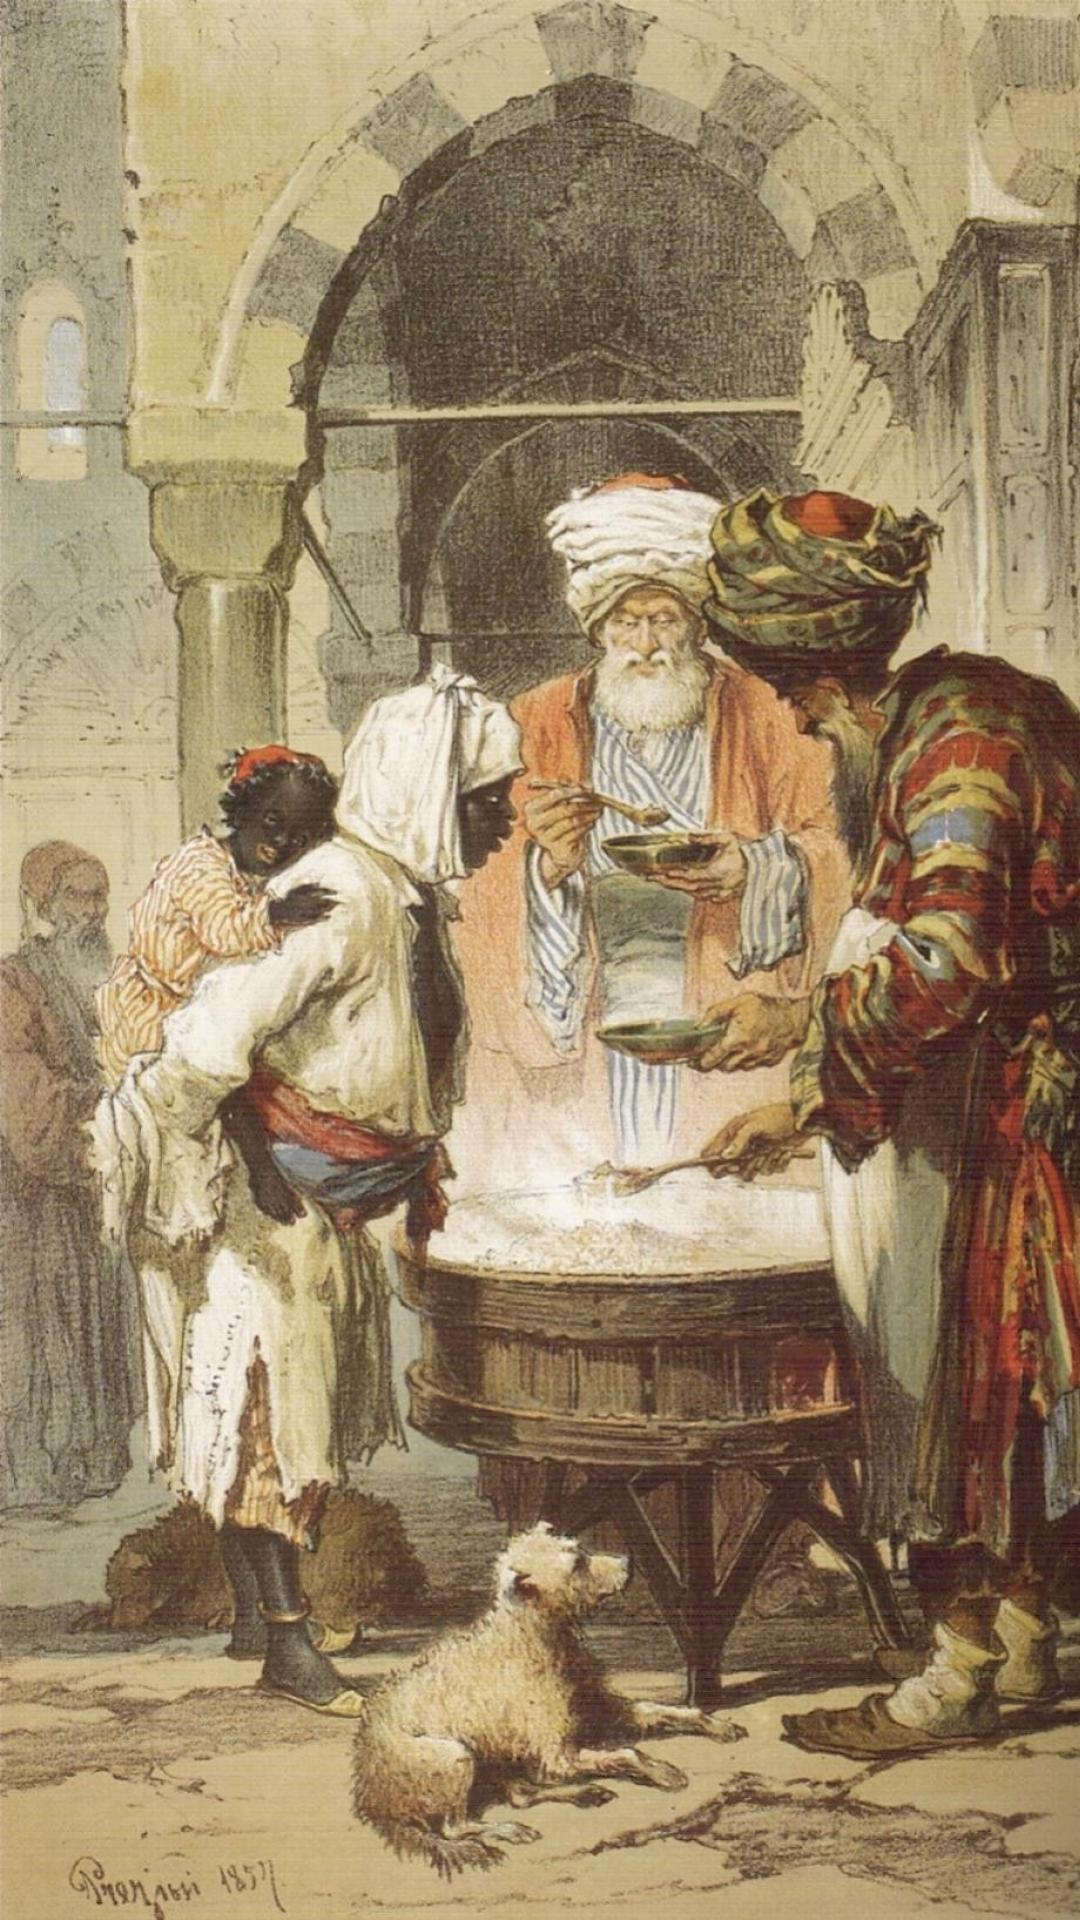 1080x1920 Islam islamic art painting history world wallpaper | (38967)